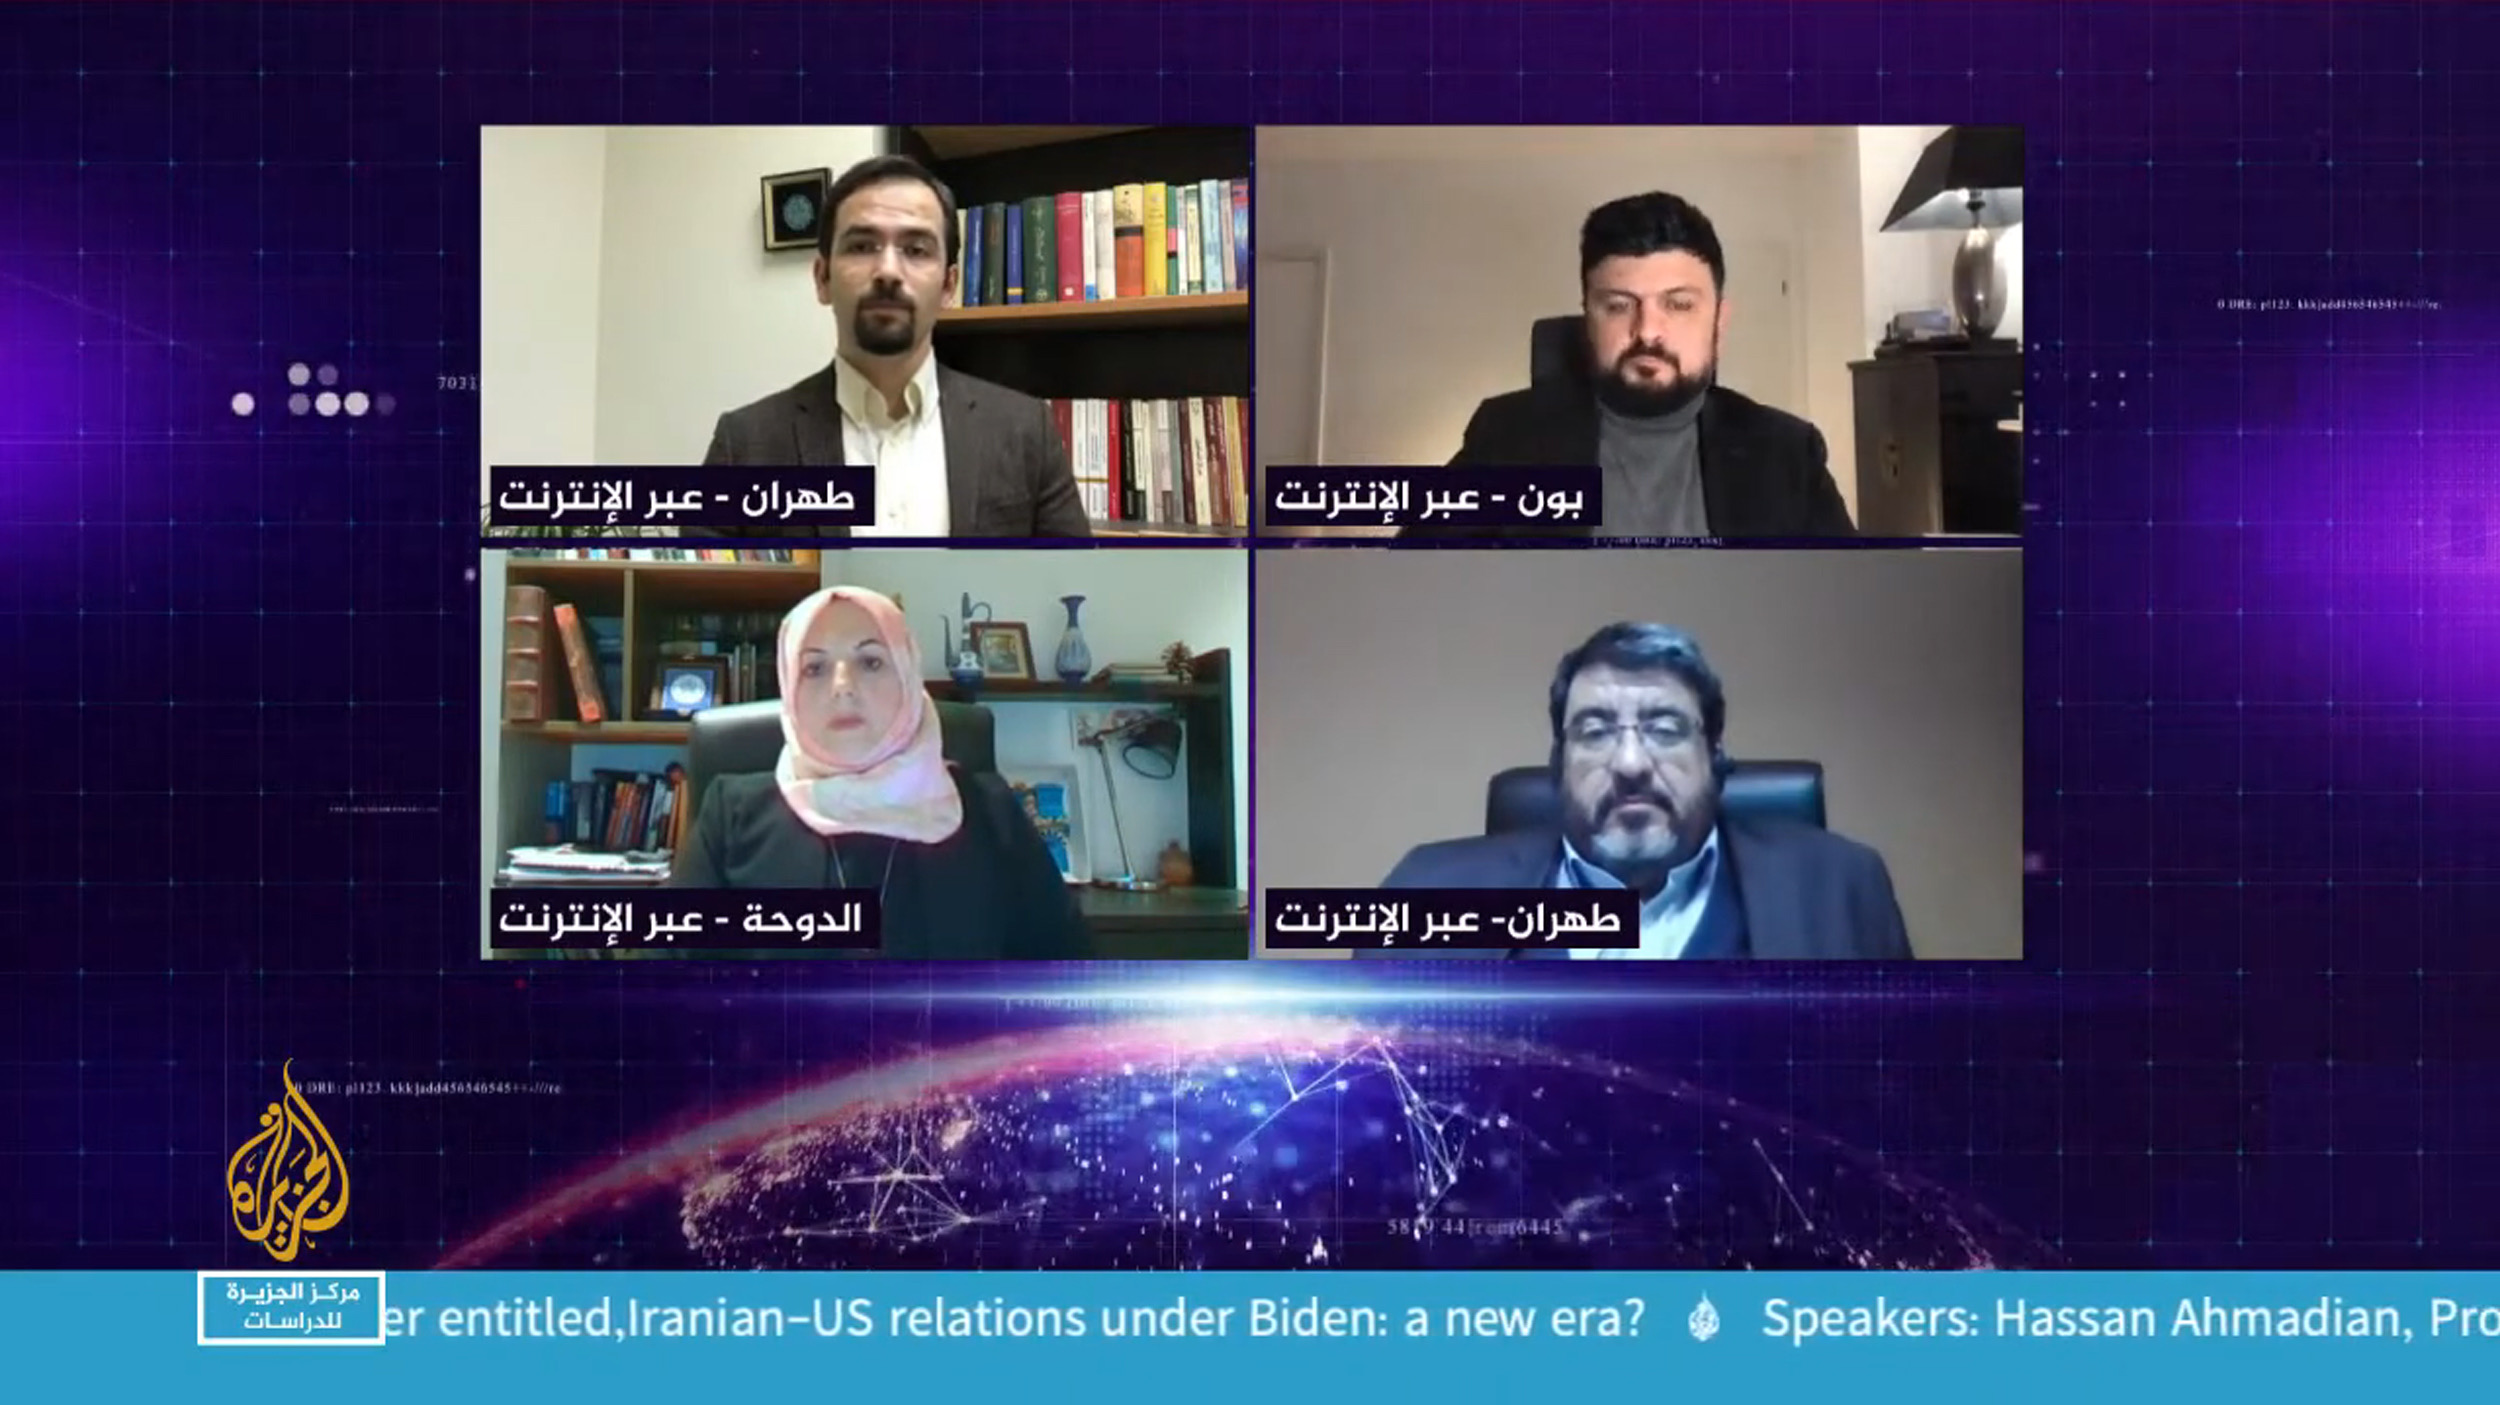 studies.aljazeera.net: Cautious optimism about the improvement of Iranian-US relations under Biden